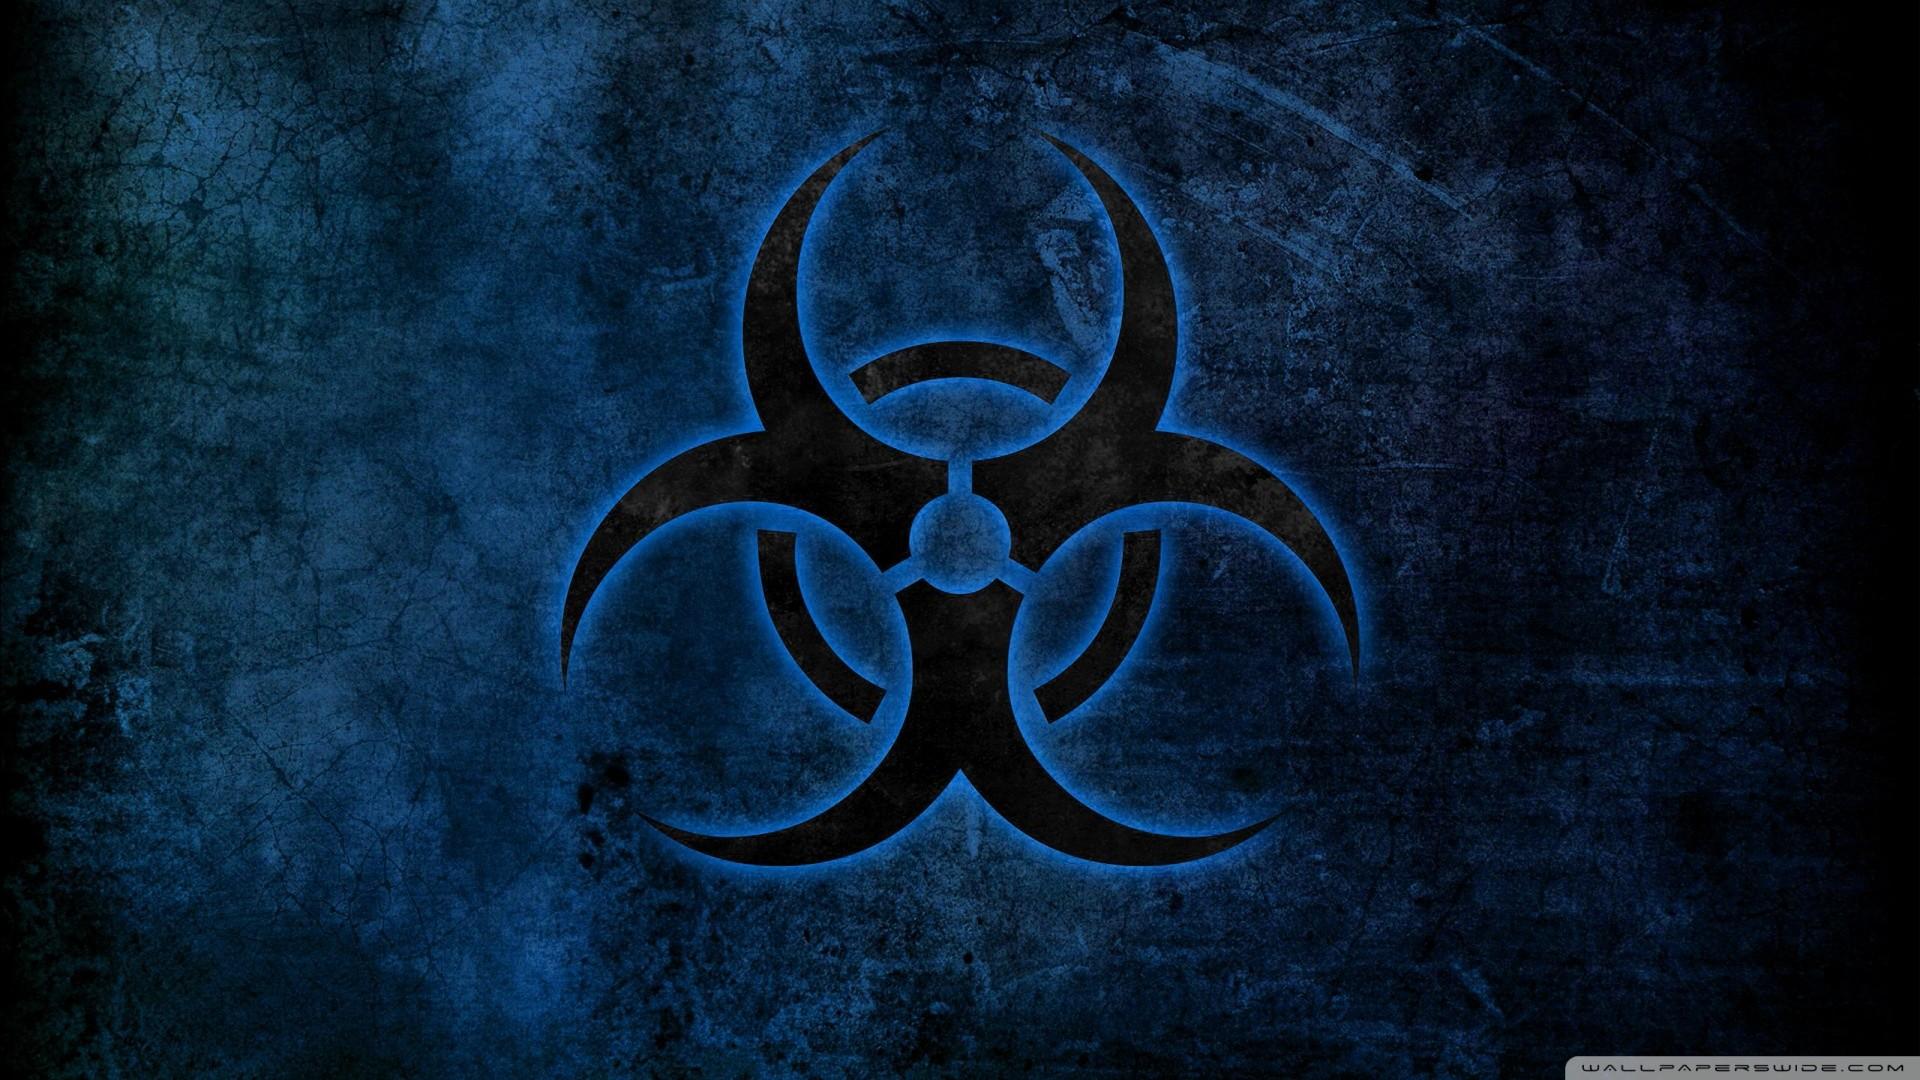 Res: 1920x1080, 10. radioactive-wallpaper-HD10-600x338